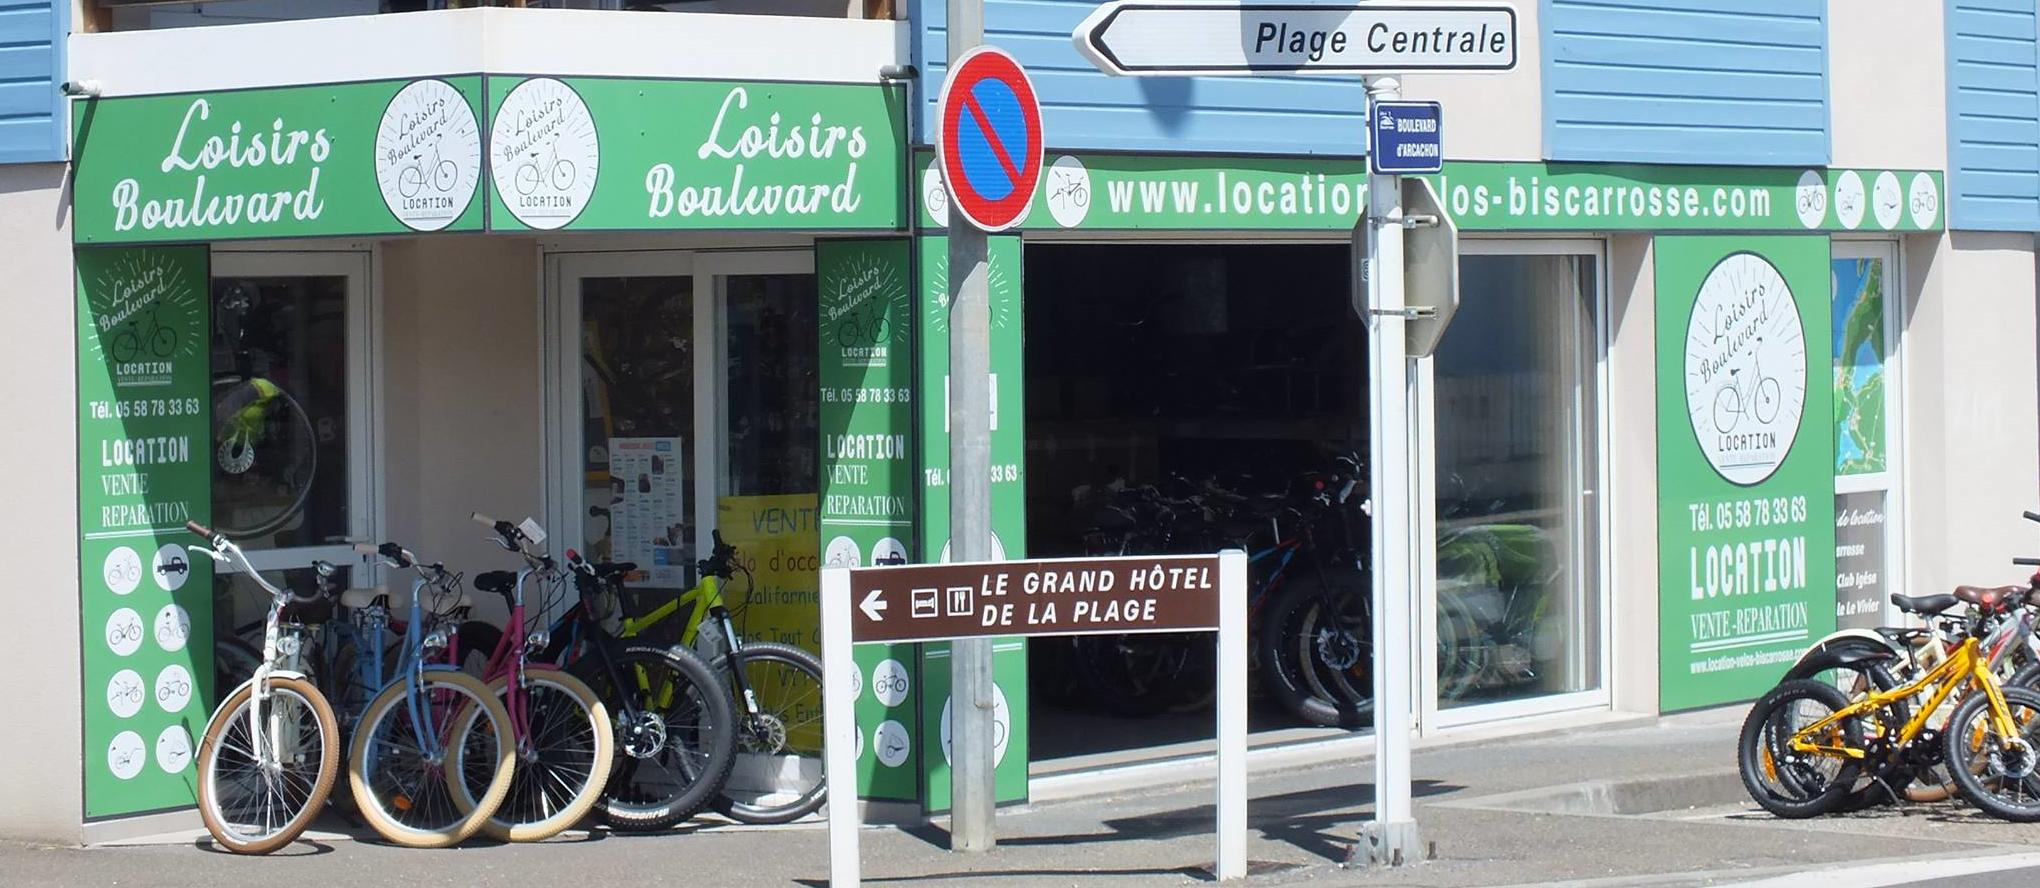 Cycle rental in Biscarrosse Plage